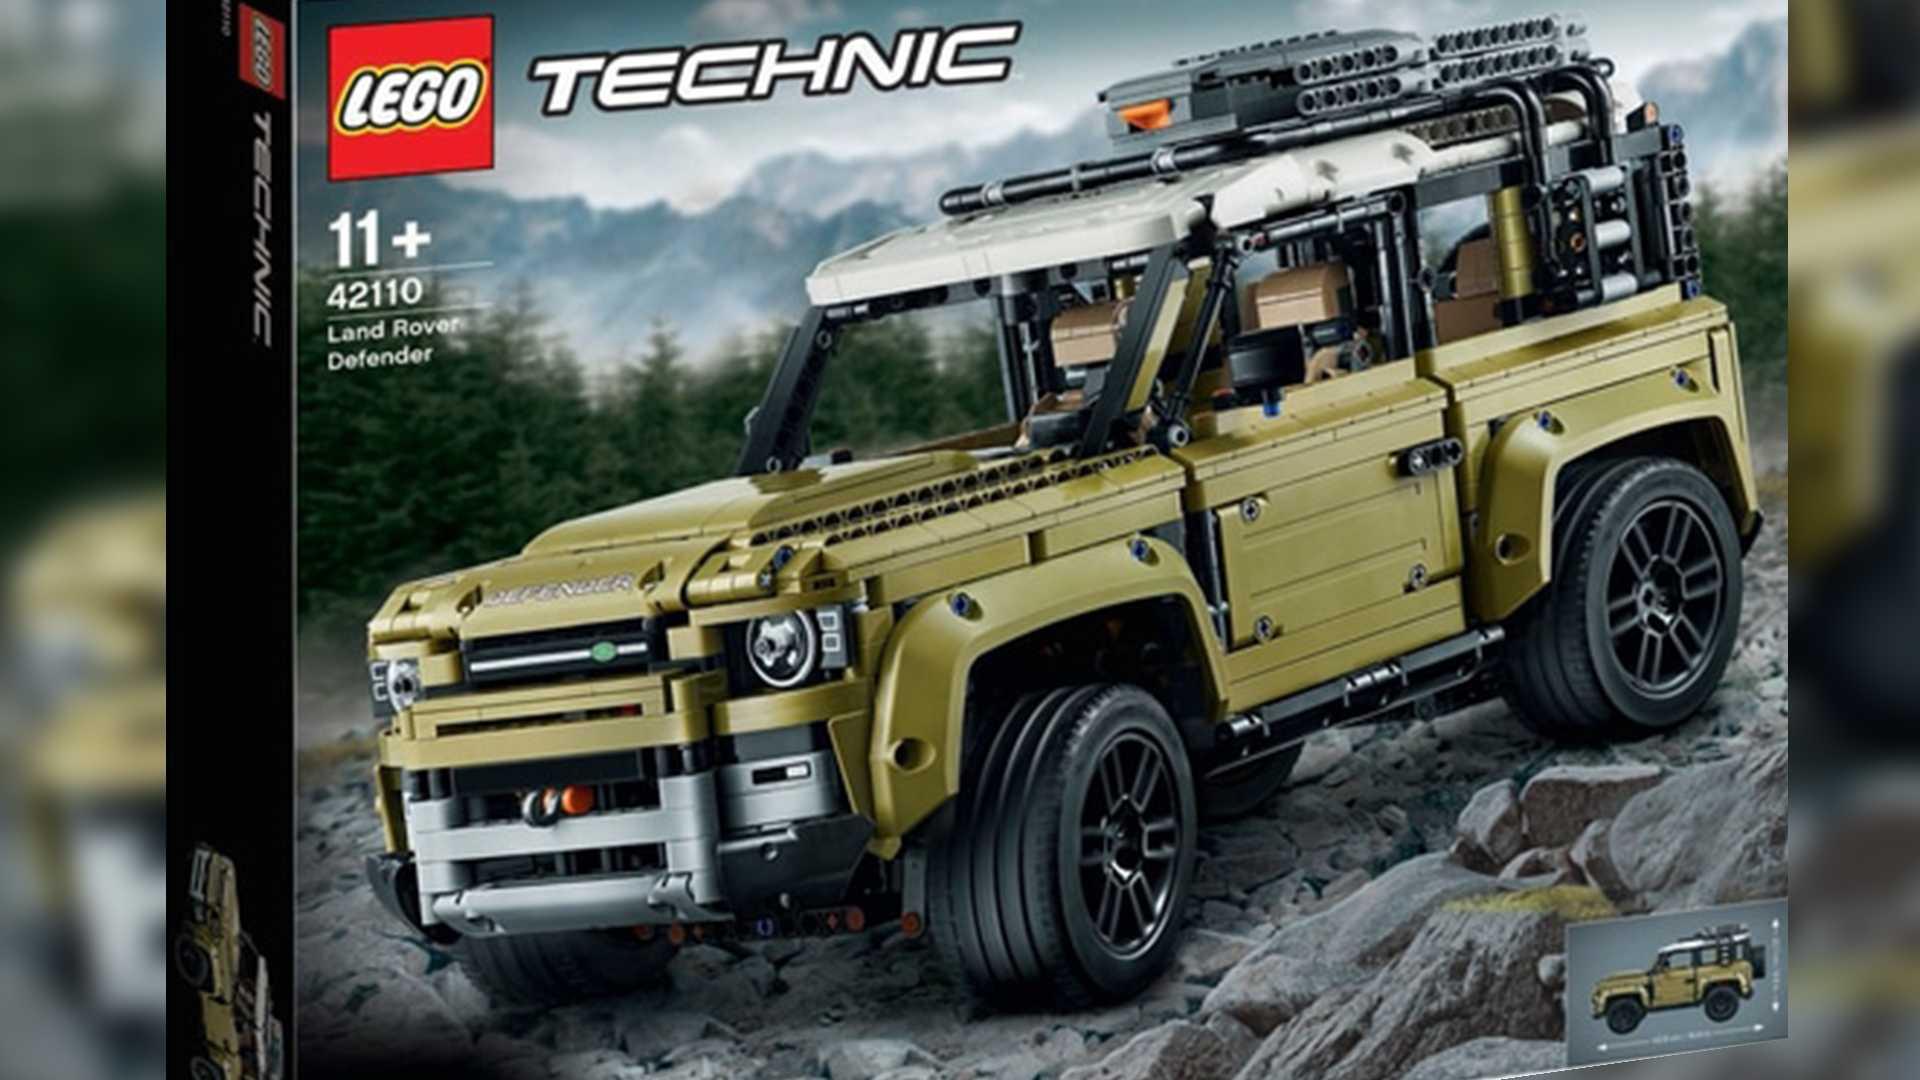 Lego Está Rover Land Defender En Camino TechnicsEl 2020 UzMqVpGS